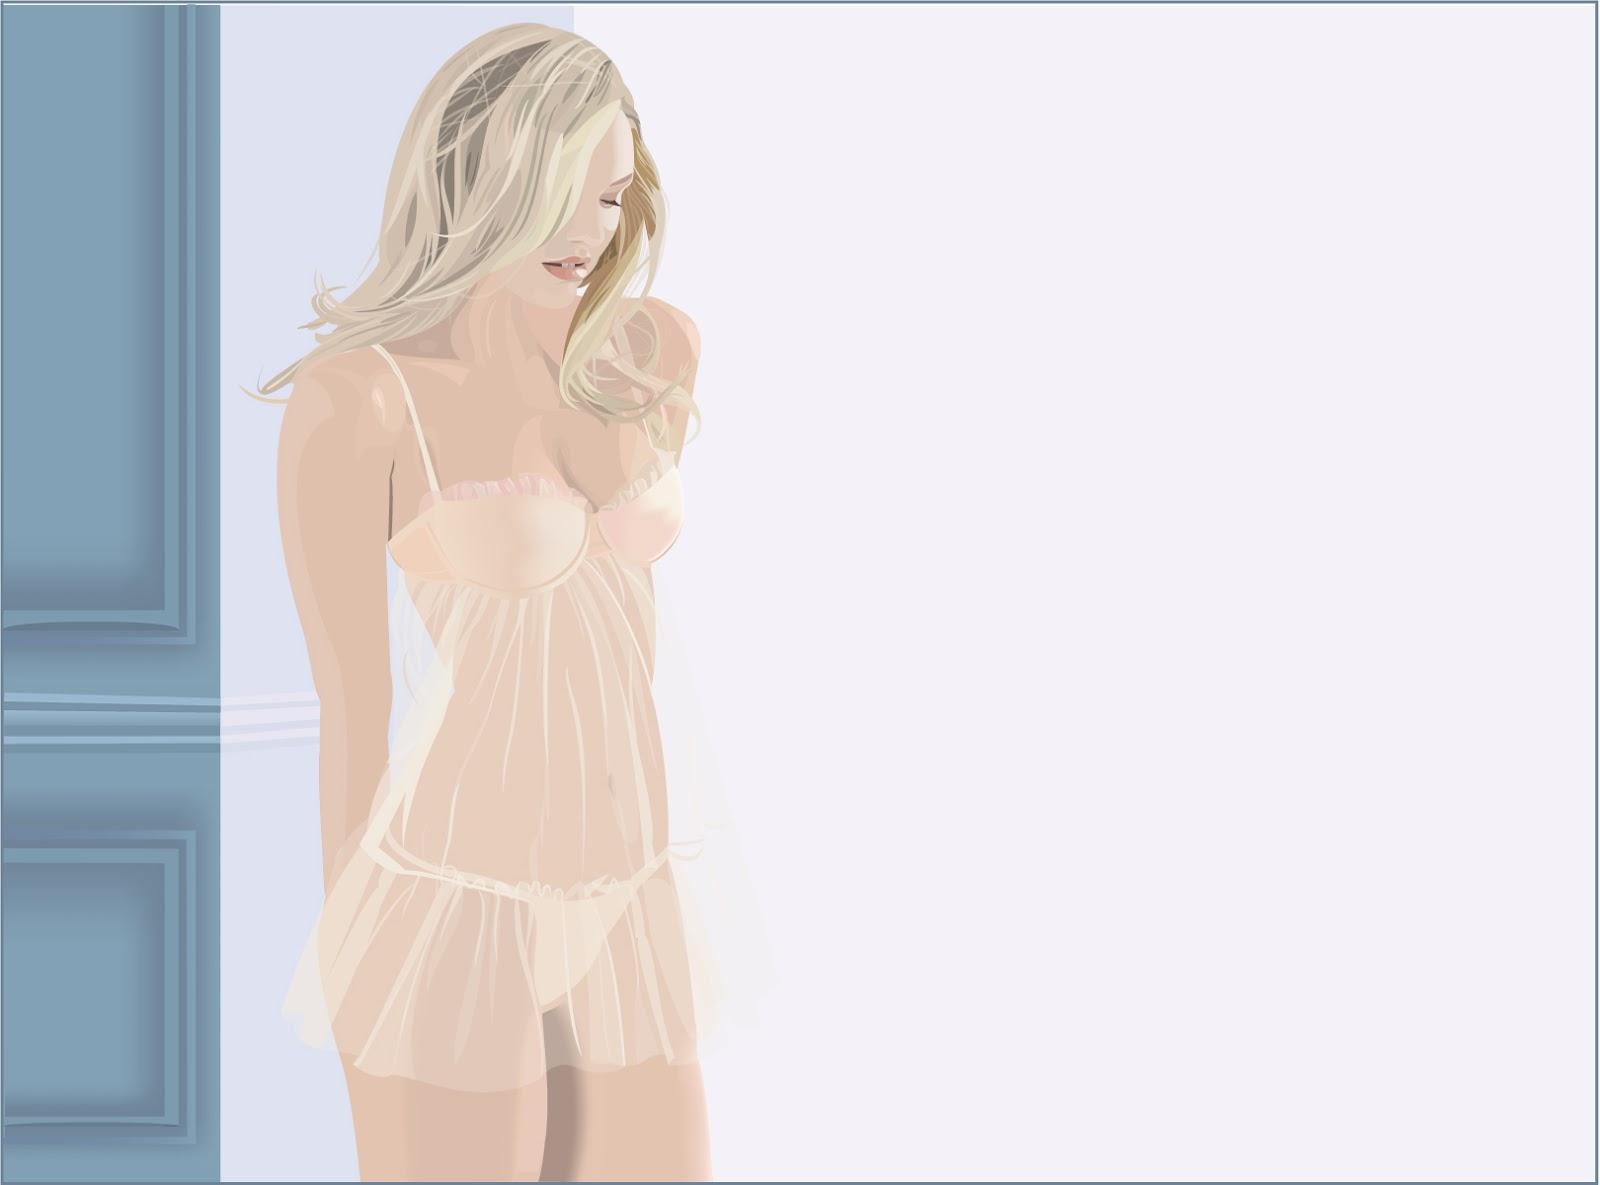 http://3.bp.blogspot.com/-dkIqMAPNvx0/UAwKMqc8hTI/AAAAAAAAAw8/260aPc4zRyo/s1600/candice-swanepoel-cartoon.jpg